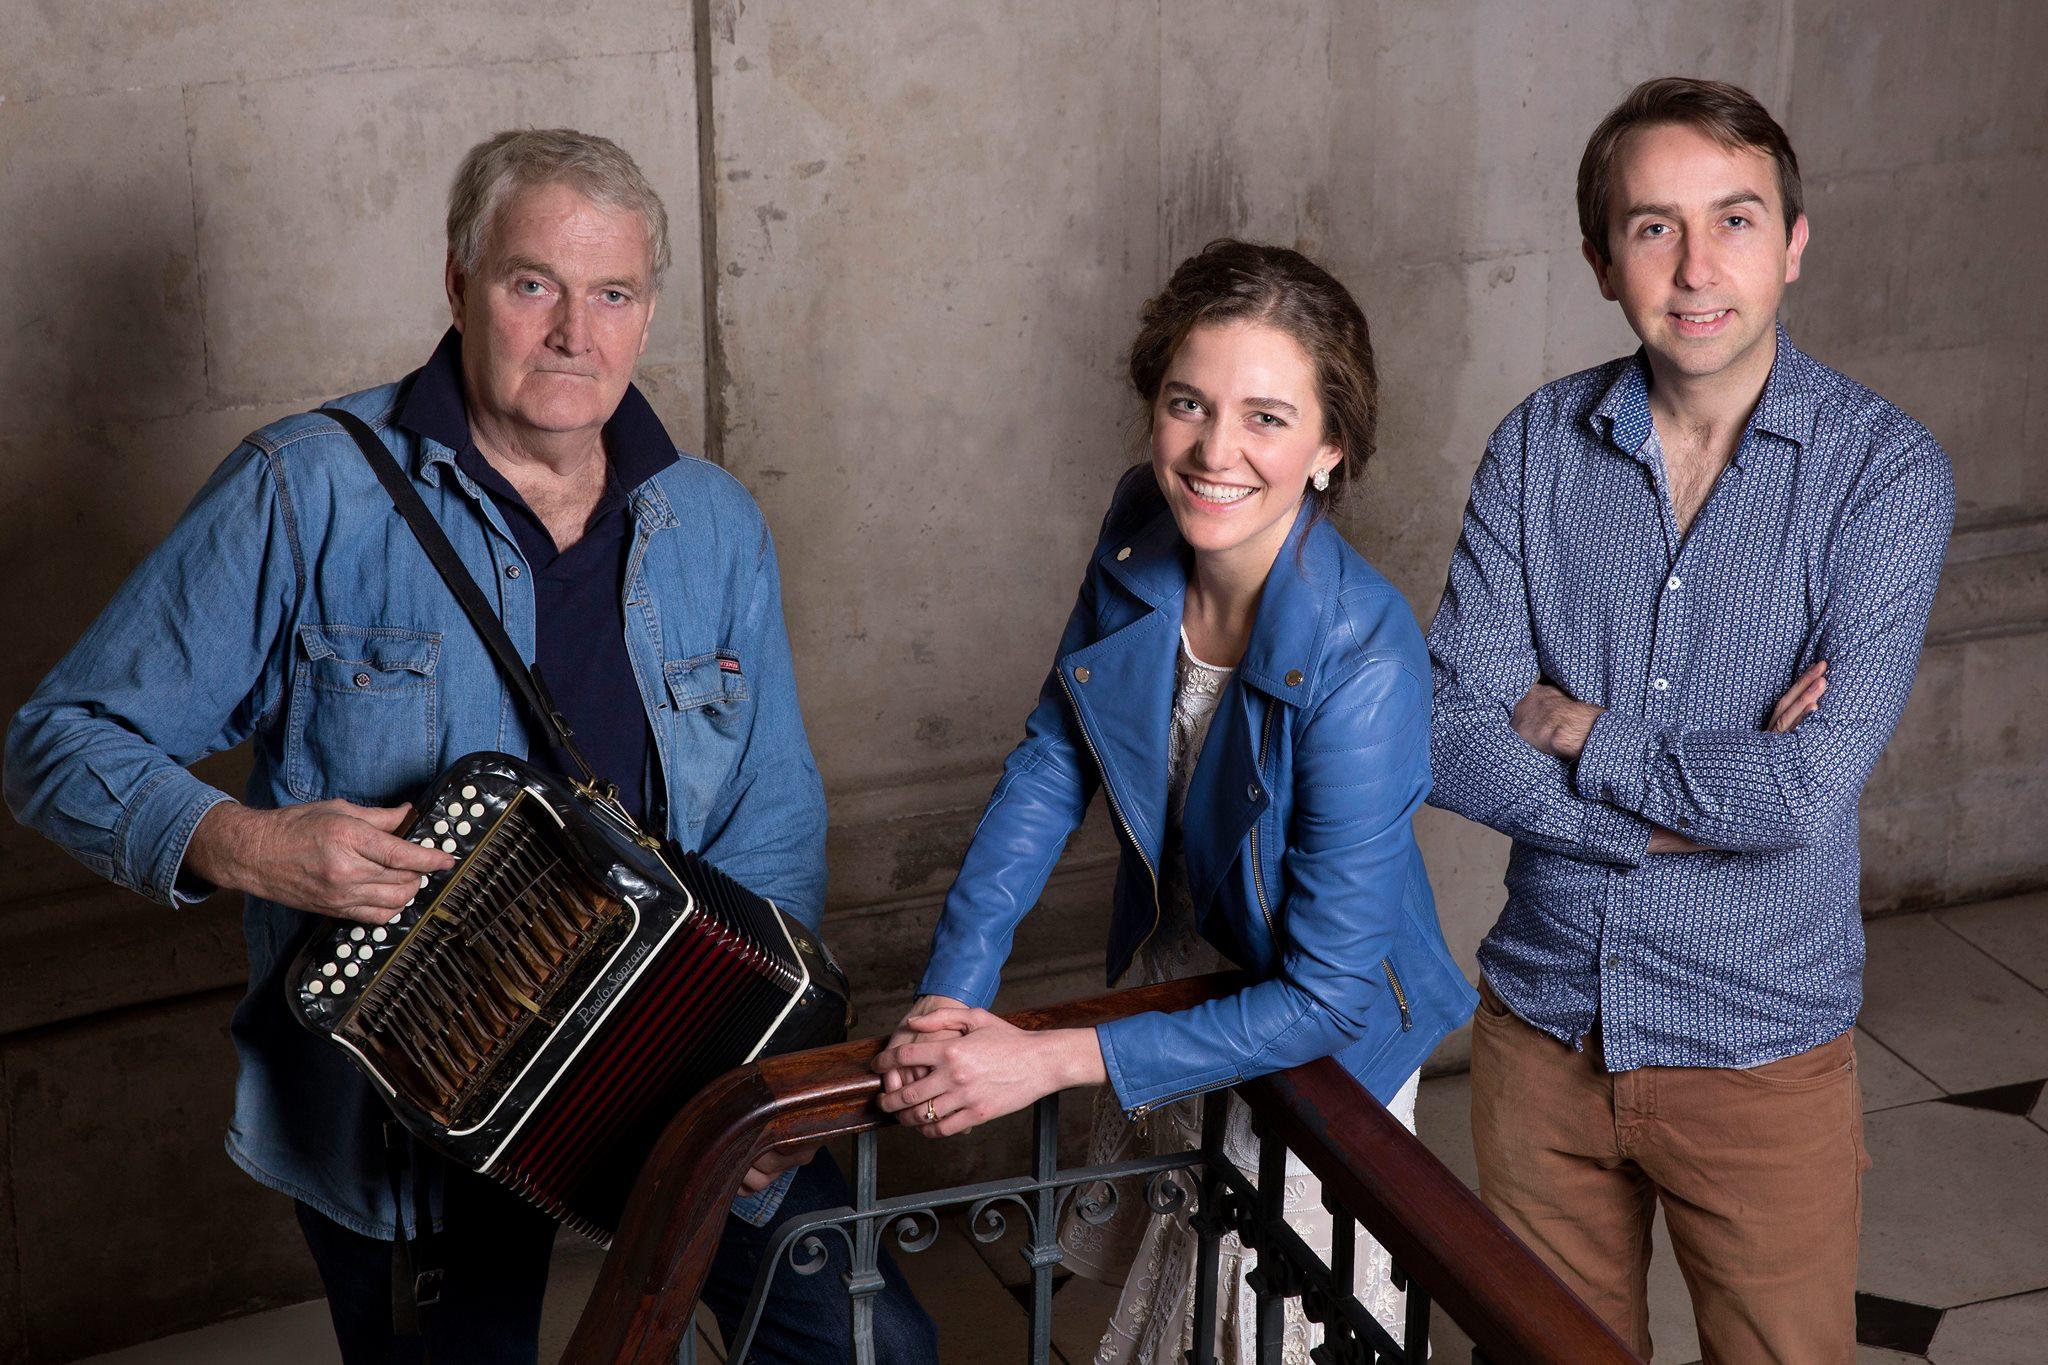 Fiddle & Bow Society presents: Oisin MacDiarmada, Seamus Begley & Samantha Harvey